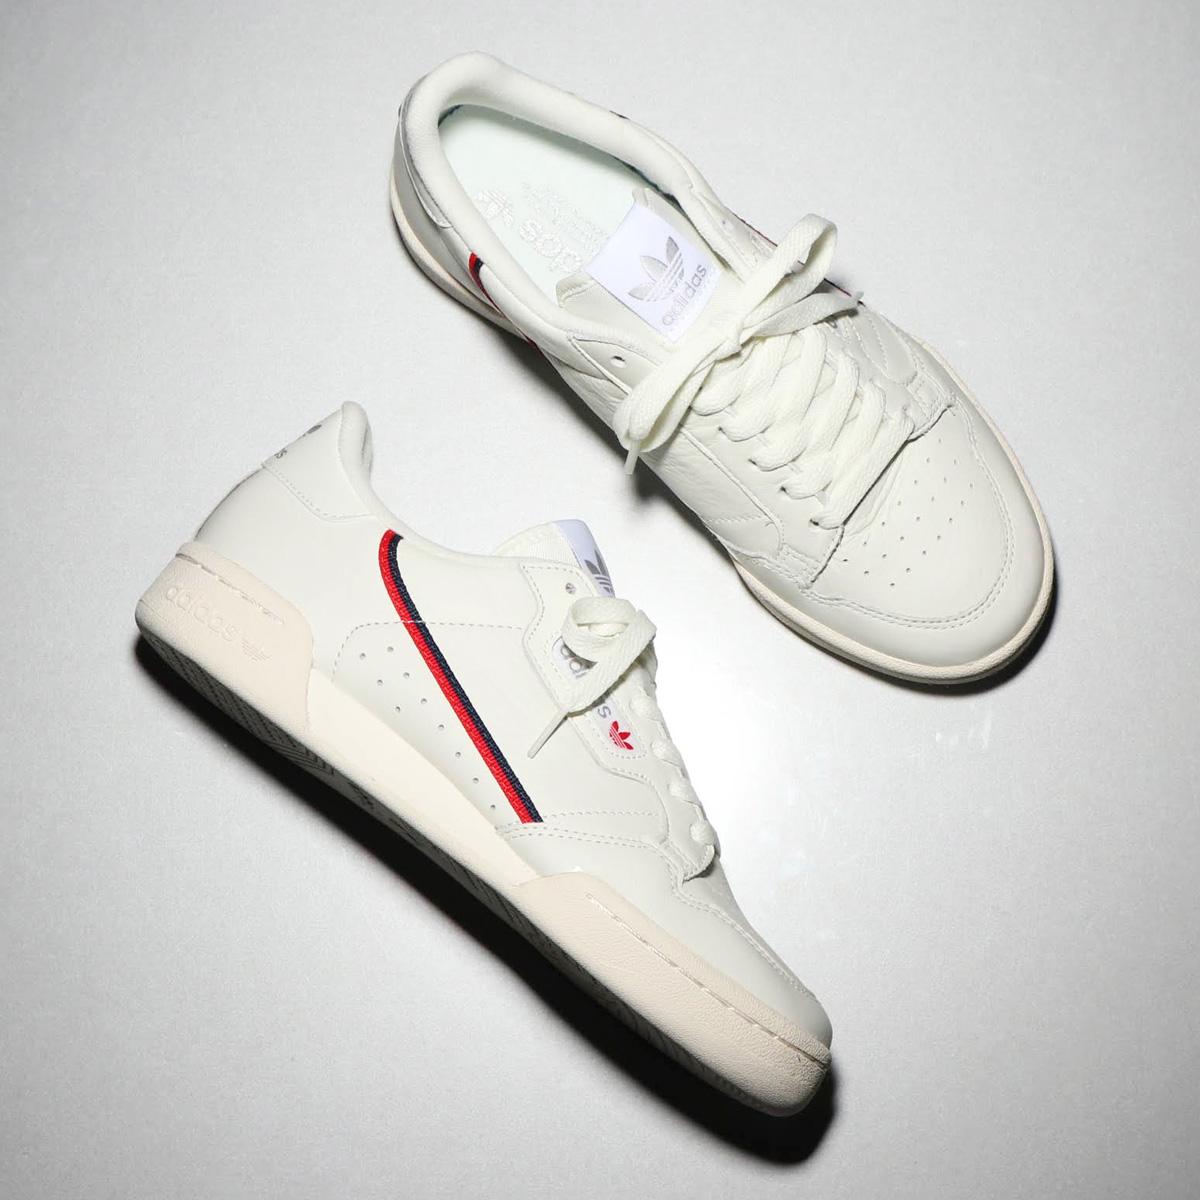 adidas originals continental 80 (adidas originals continental 80) beige / cremefarbig / scarlet 18fw ich